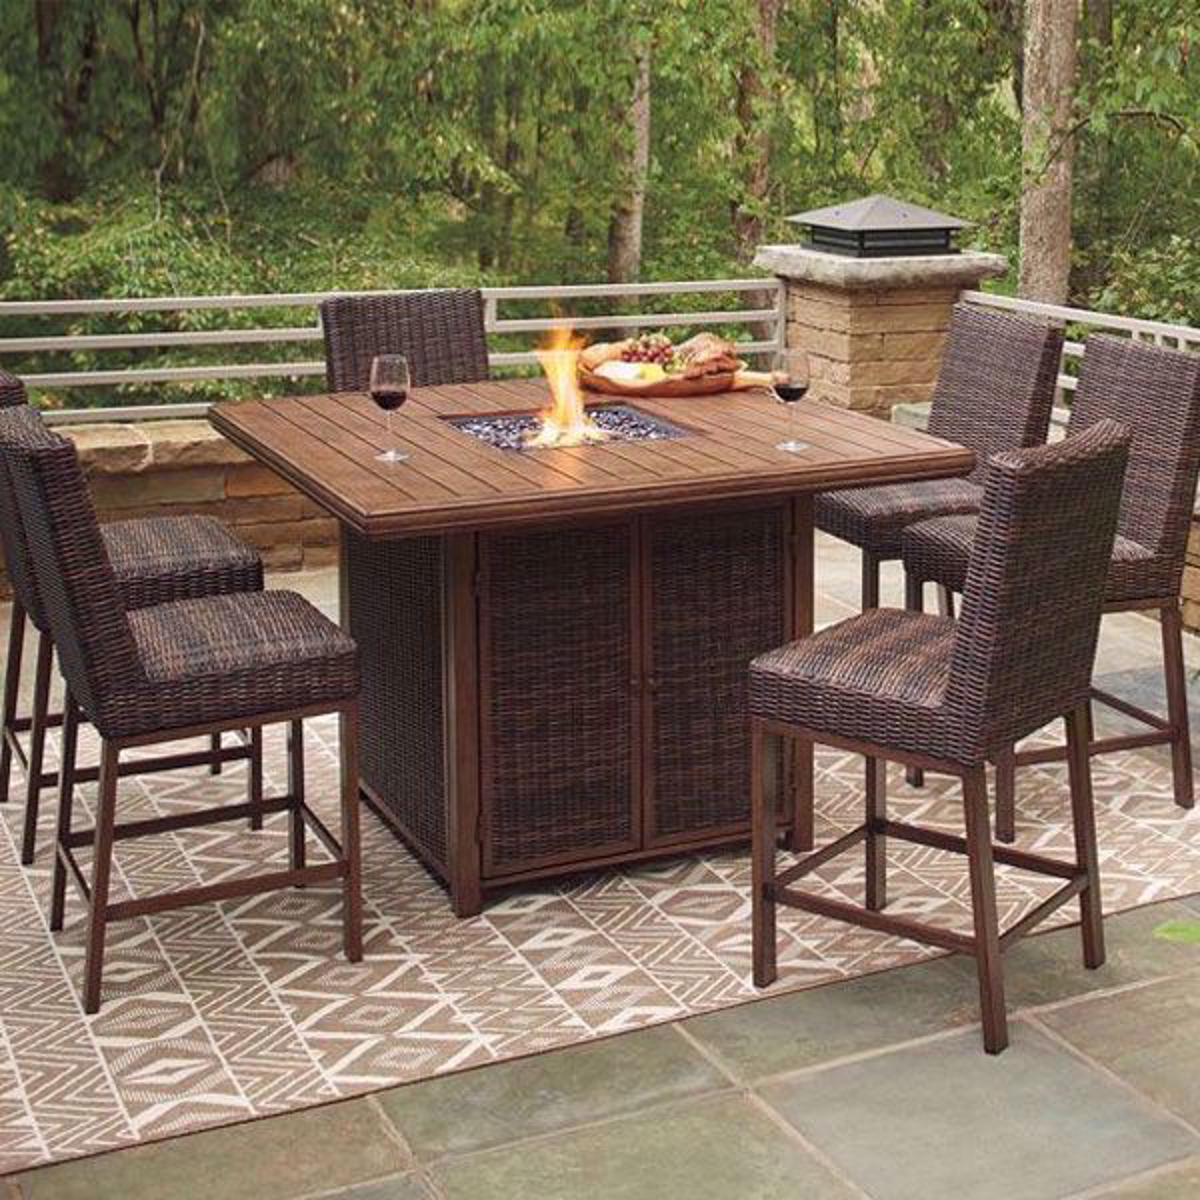 Picture of Denver 7 Piece Outdoor Firepit Table Set